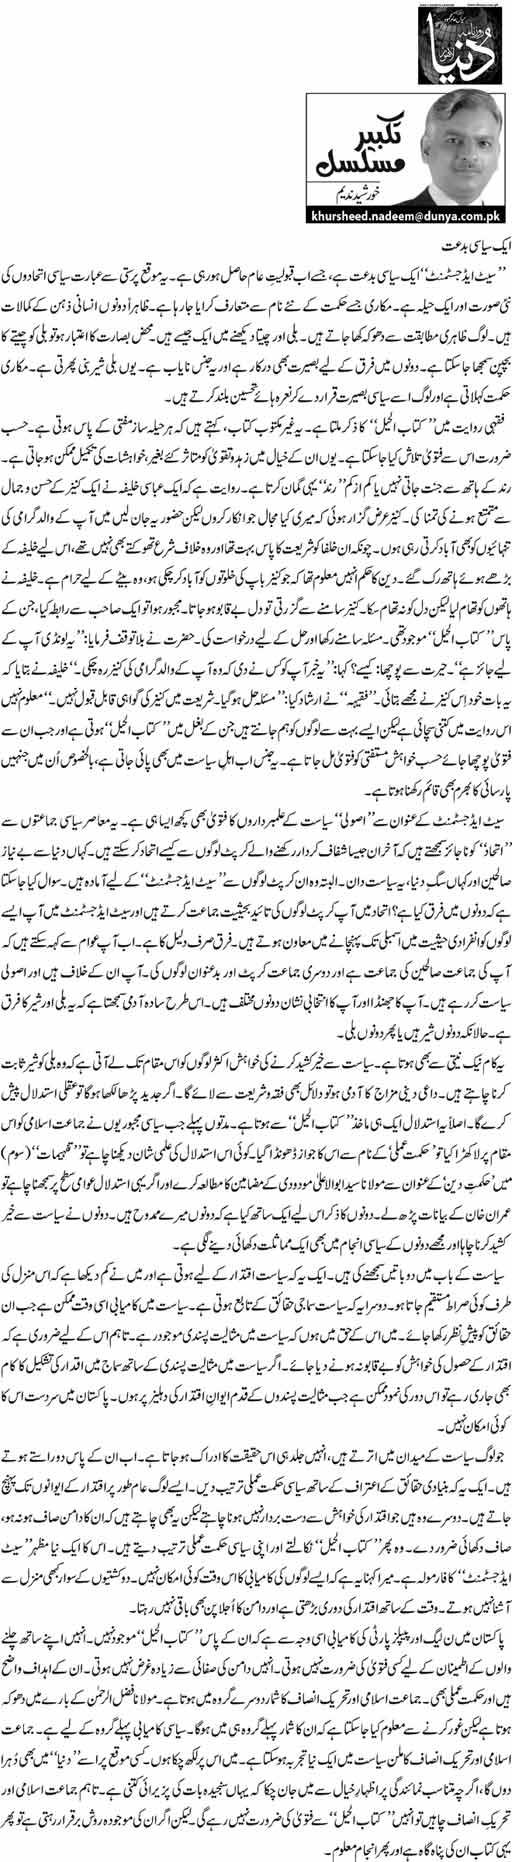 Aik siyasi biddat - Khursheed Nadeem